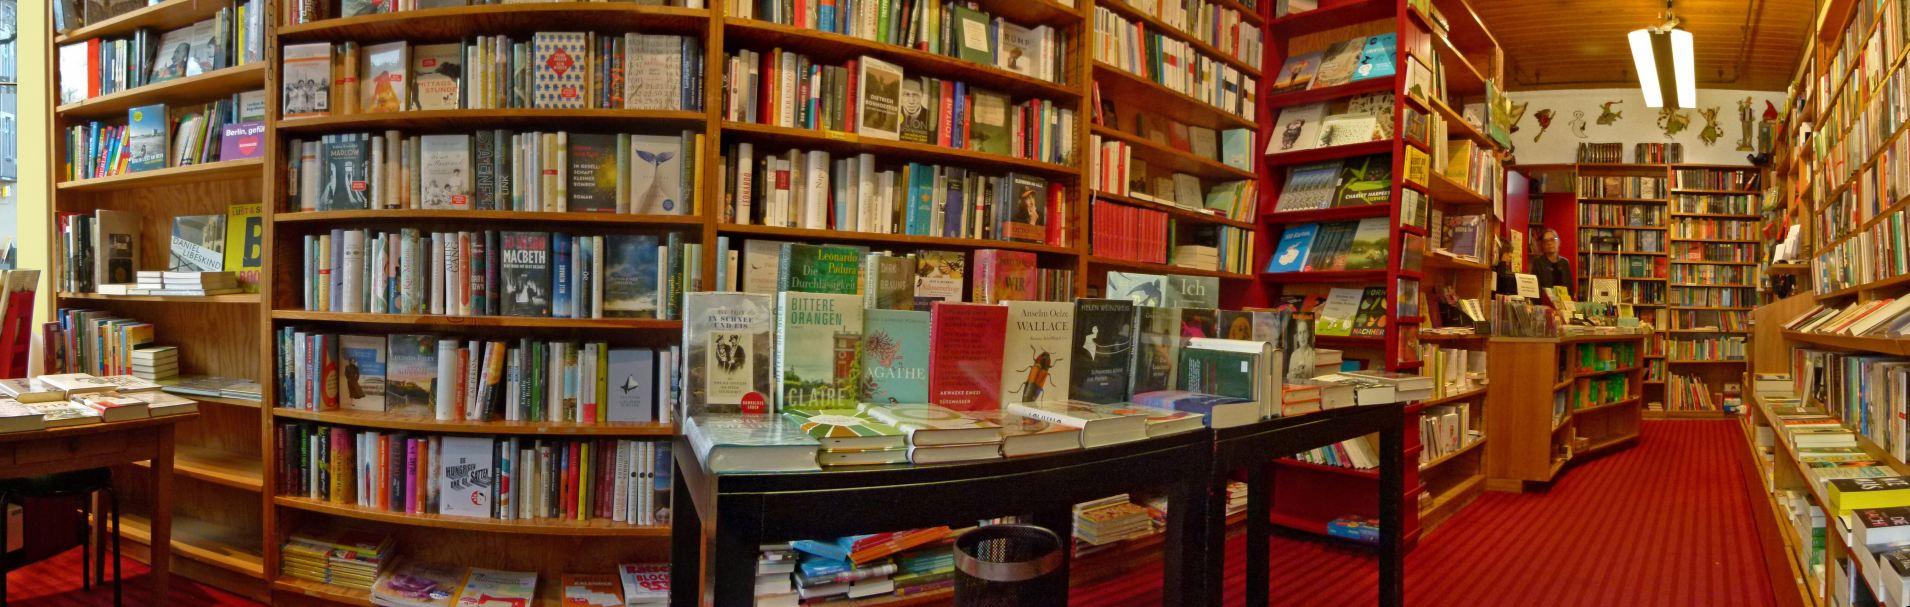 Buchhandlung Holzapfel